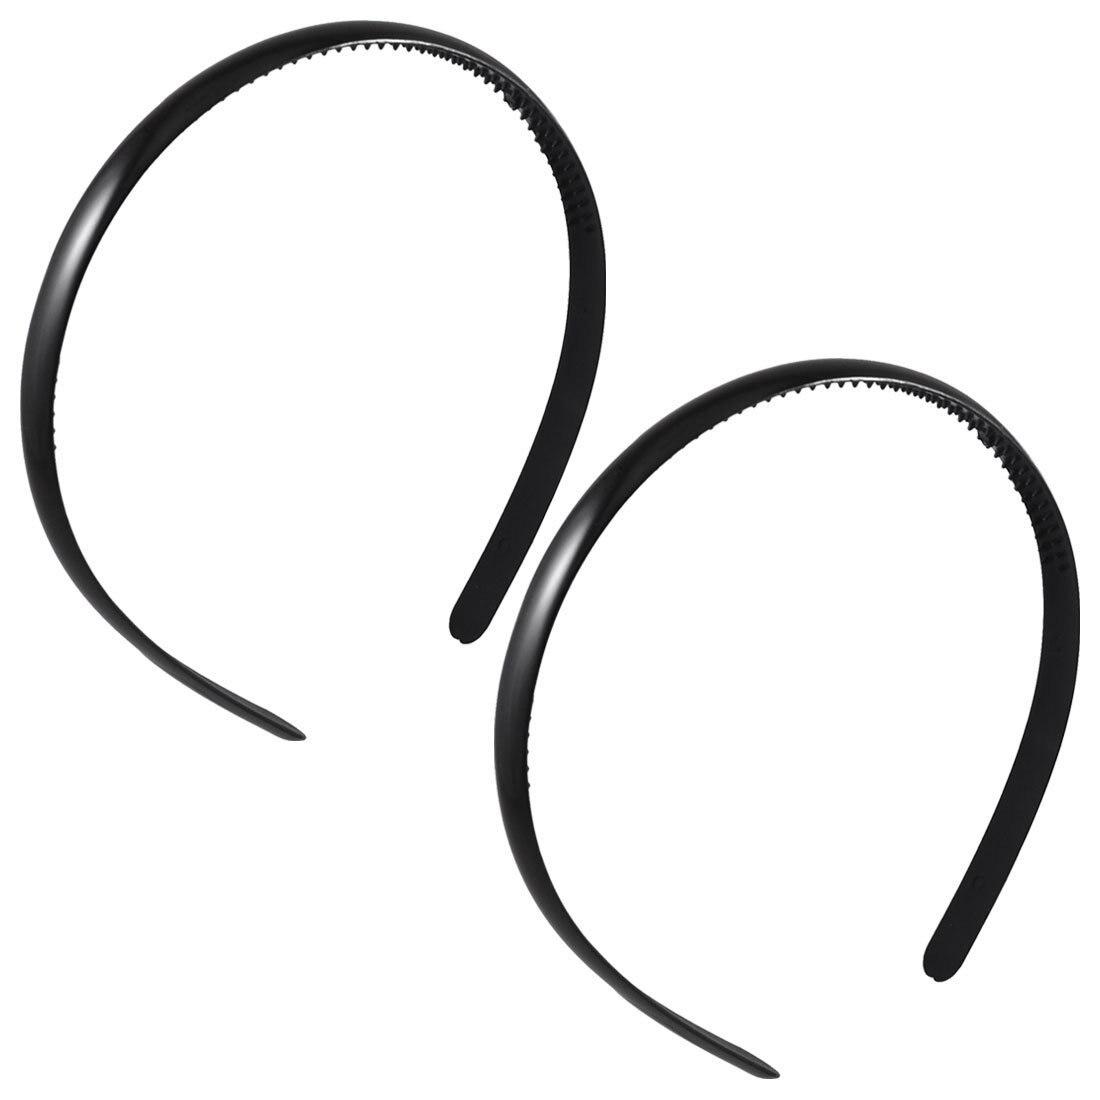 IMC 2 Pcs Black Plastic Frame Dual Row Teeth Hair Hoop Head Band for Girls ark benefit u2 dual black